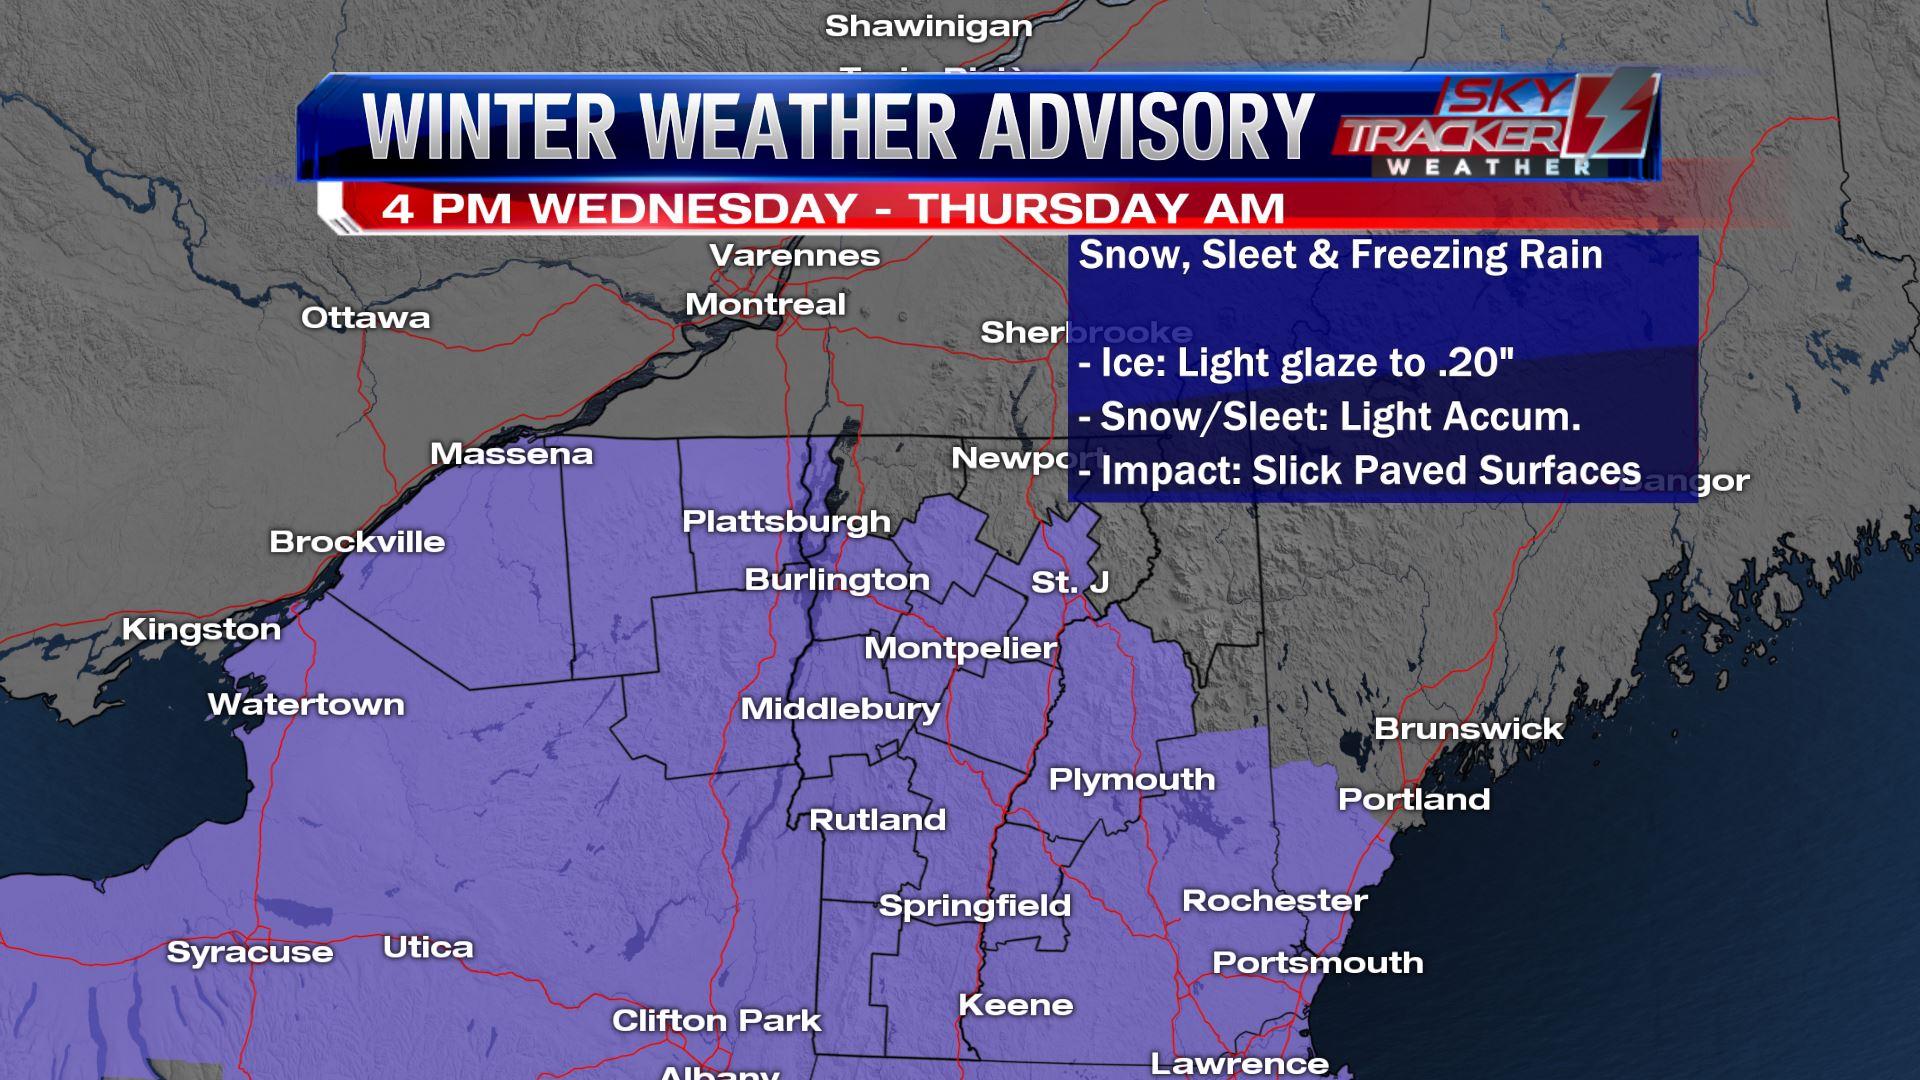 Wednesday February 6th Winter Weather Advisory